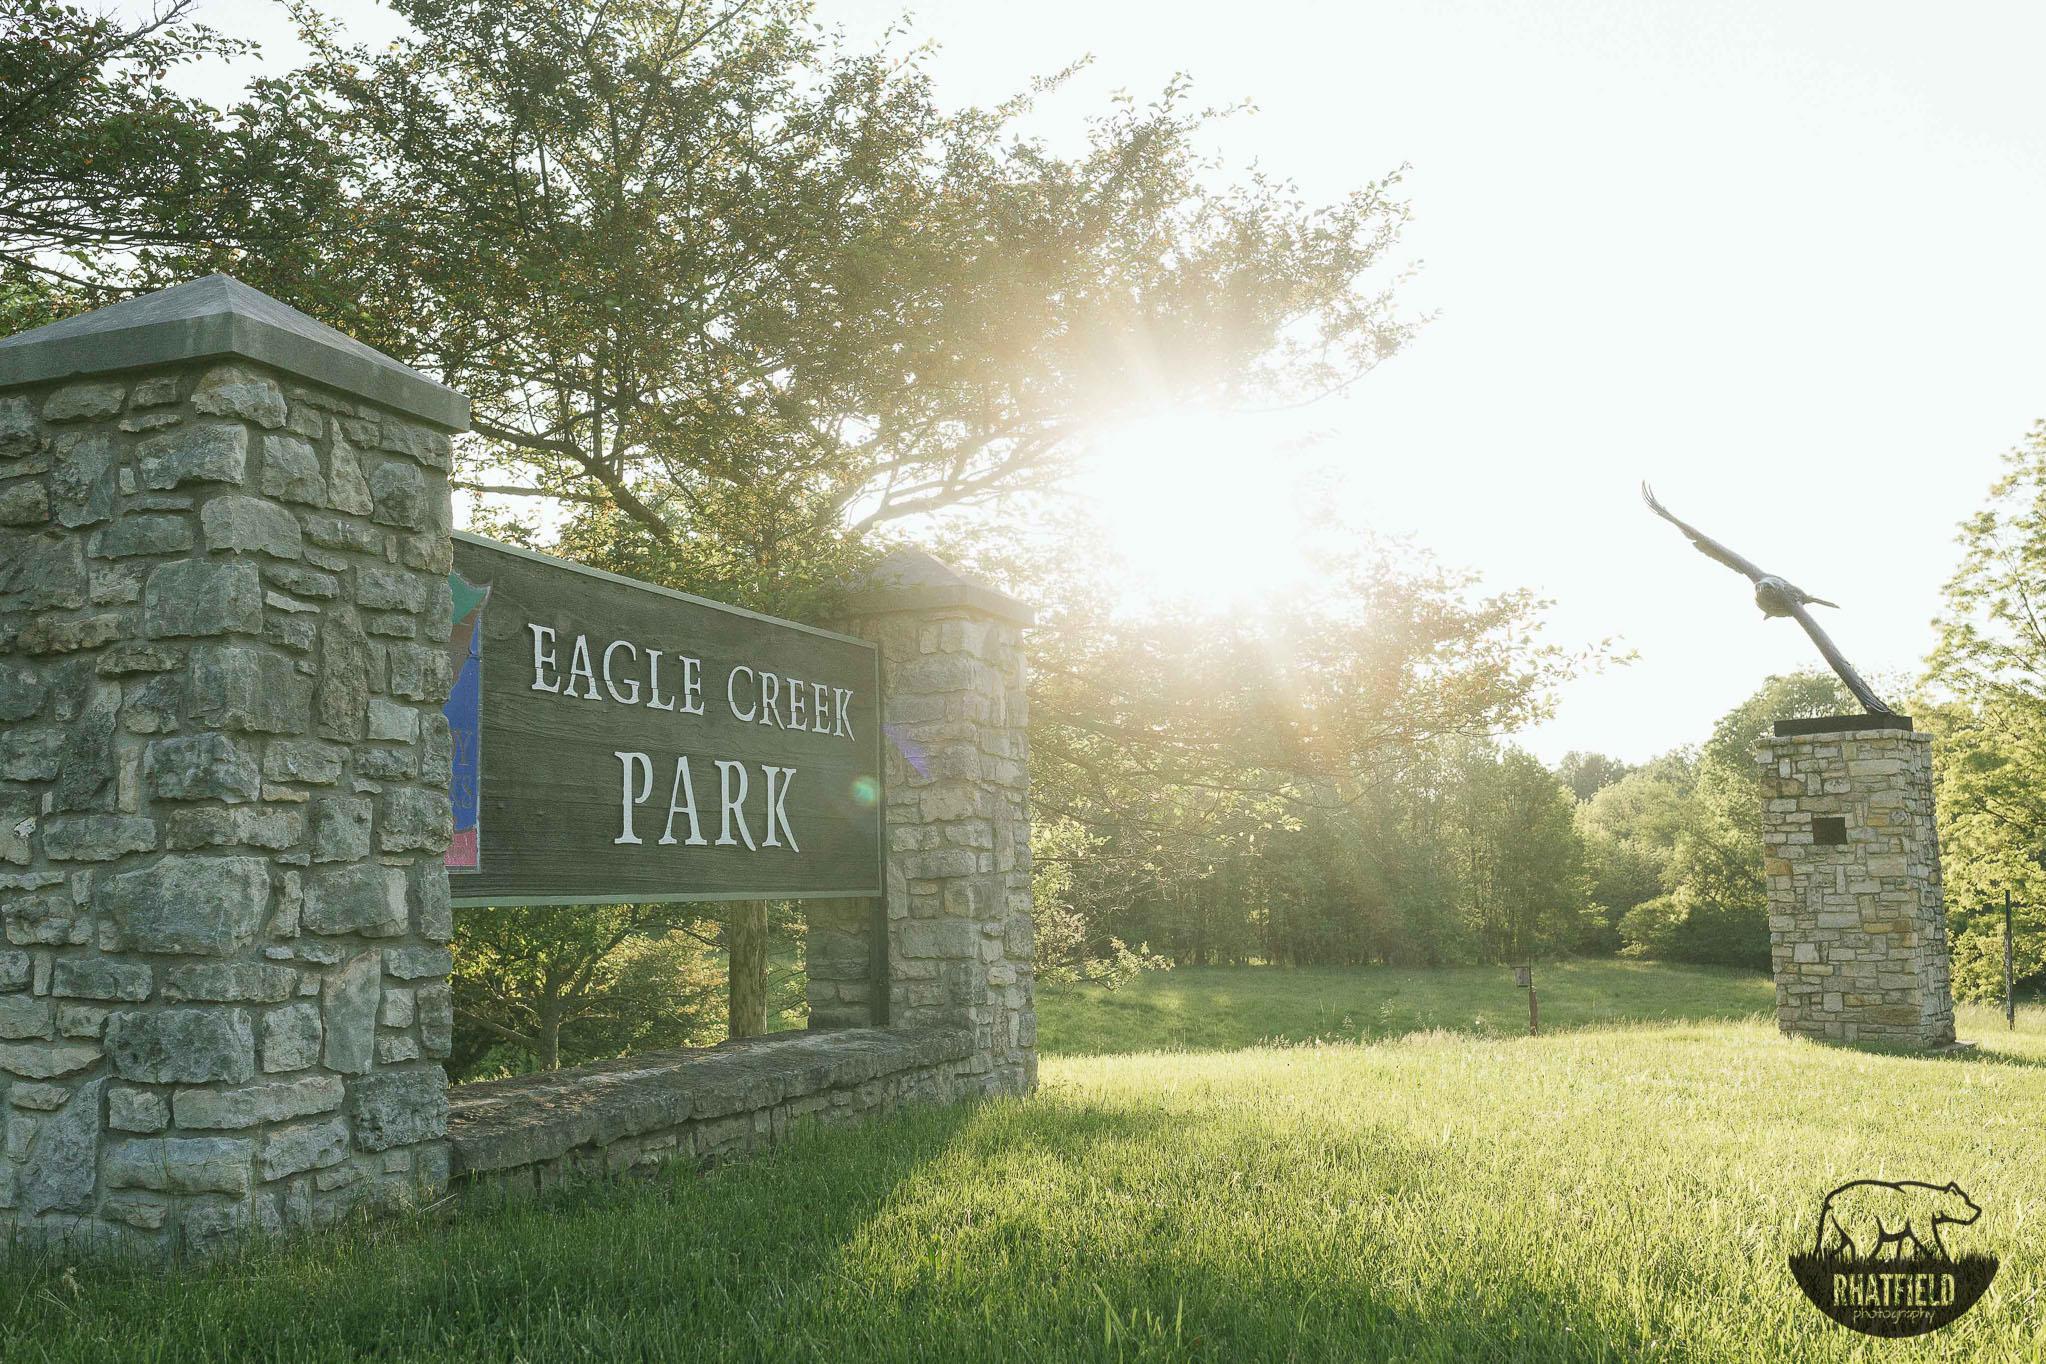 eagle-creek-park-indianapolis